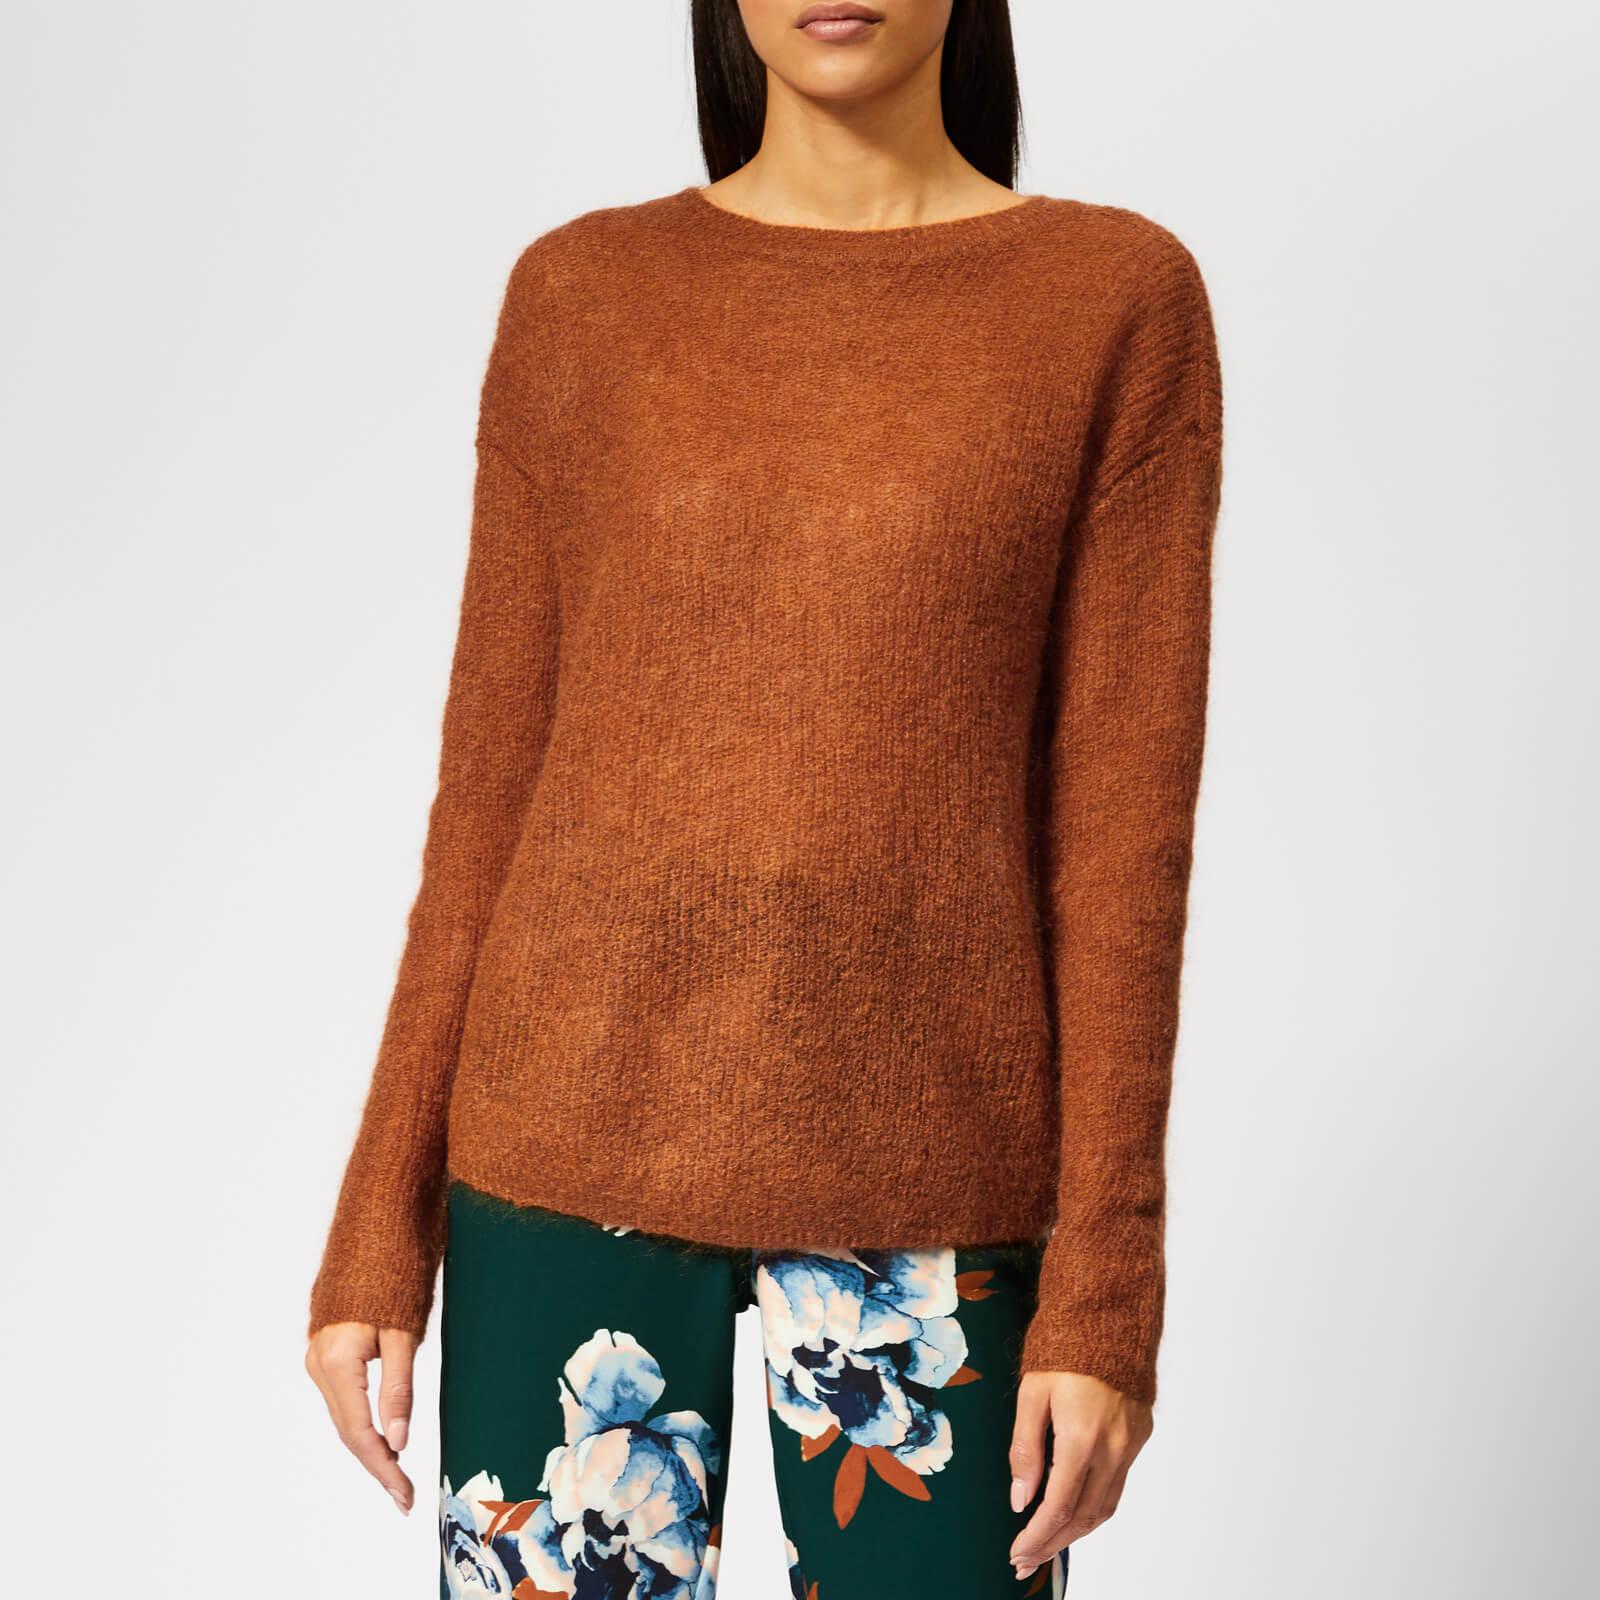 Gestuz Women's Molly Pullover Jumper - Gingerbread - S - Orange